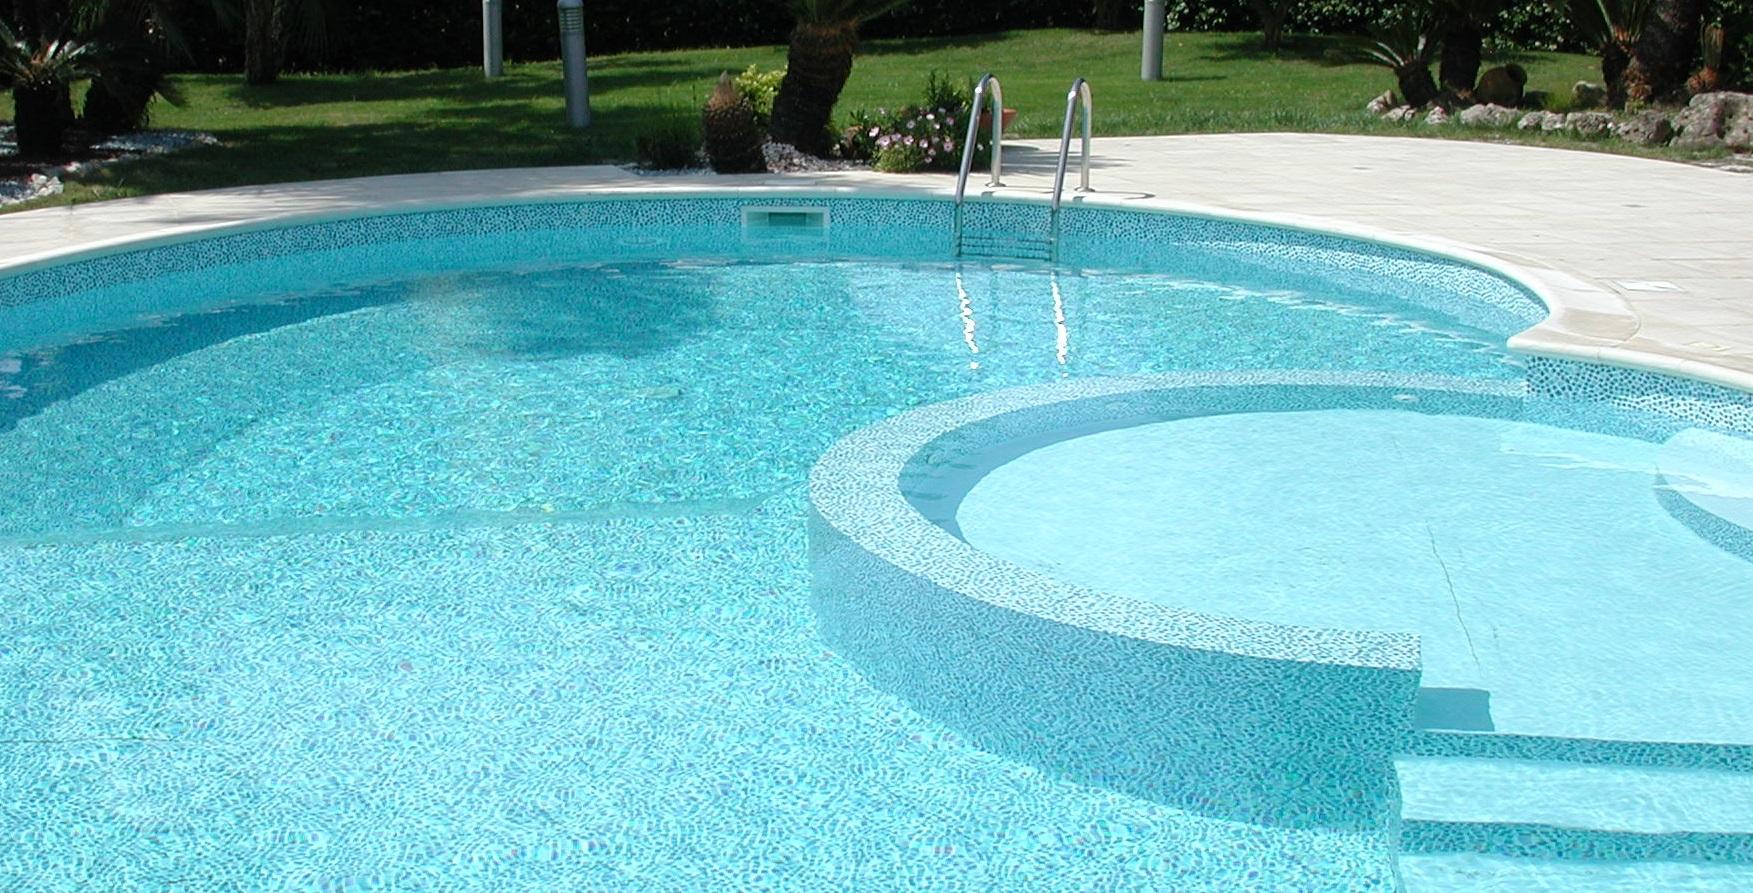 Elettrolisi del sale in piscina elettrolisi del sale in piscina - Piscina a sale ...